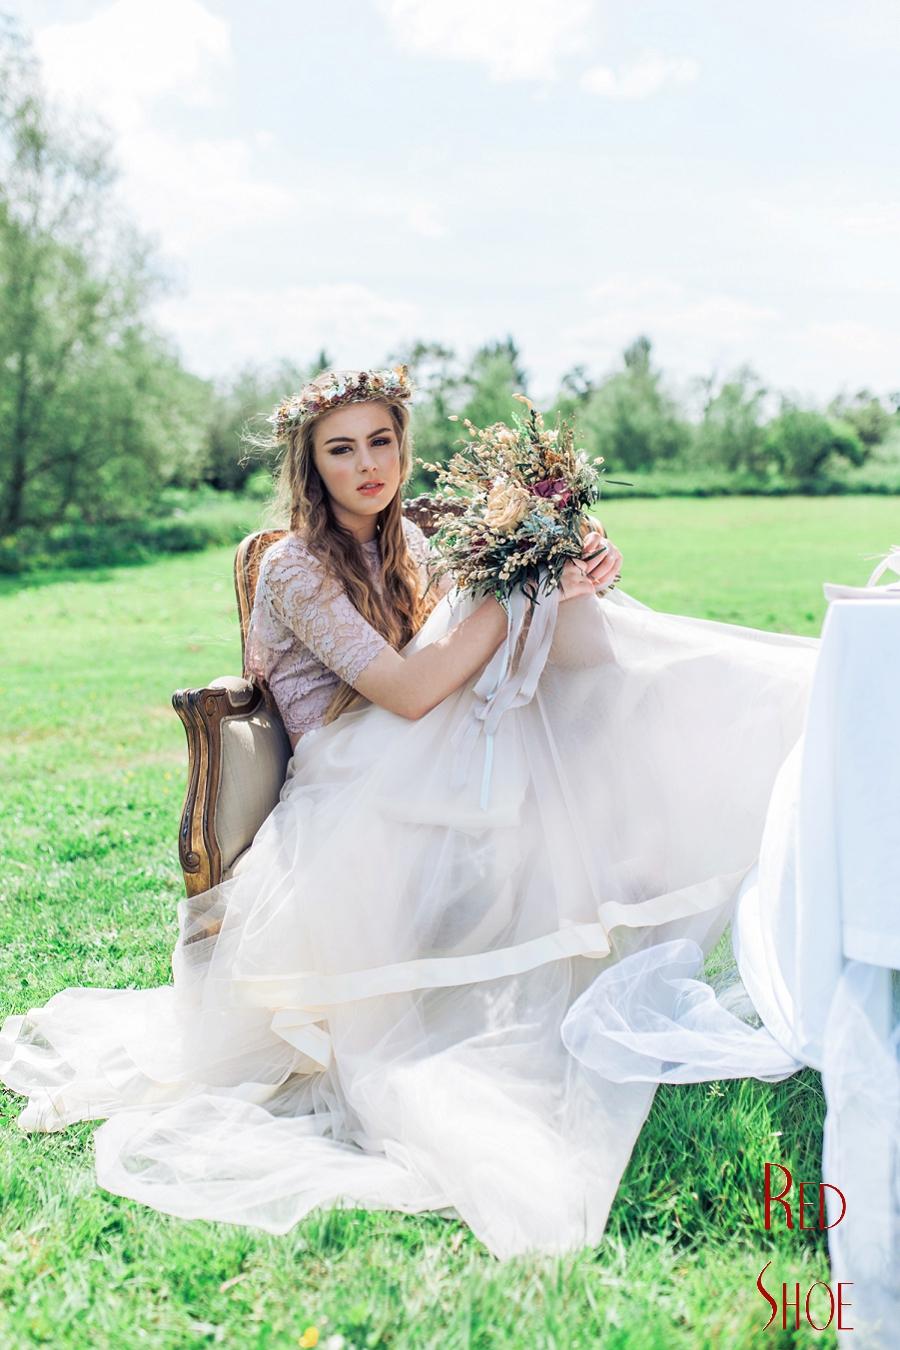 Boho bride, Glam Boho bride, Wedding inspiration, Styled wedding photo shoot, wedding ideas, wedding flower ideas, wedding photography, dried wedding flowers, boho bride makeup ideas_0094.jpg